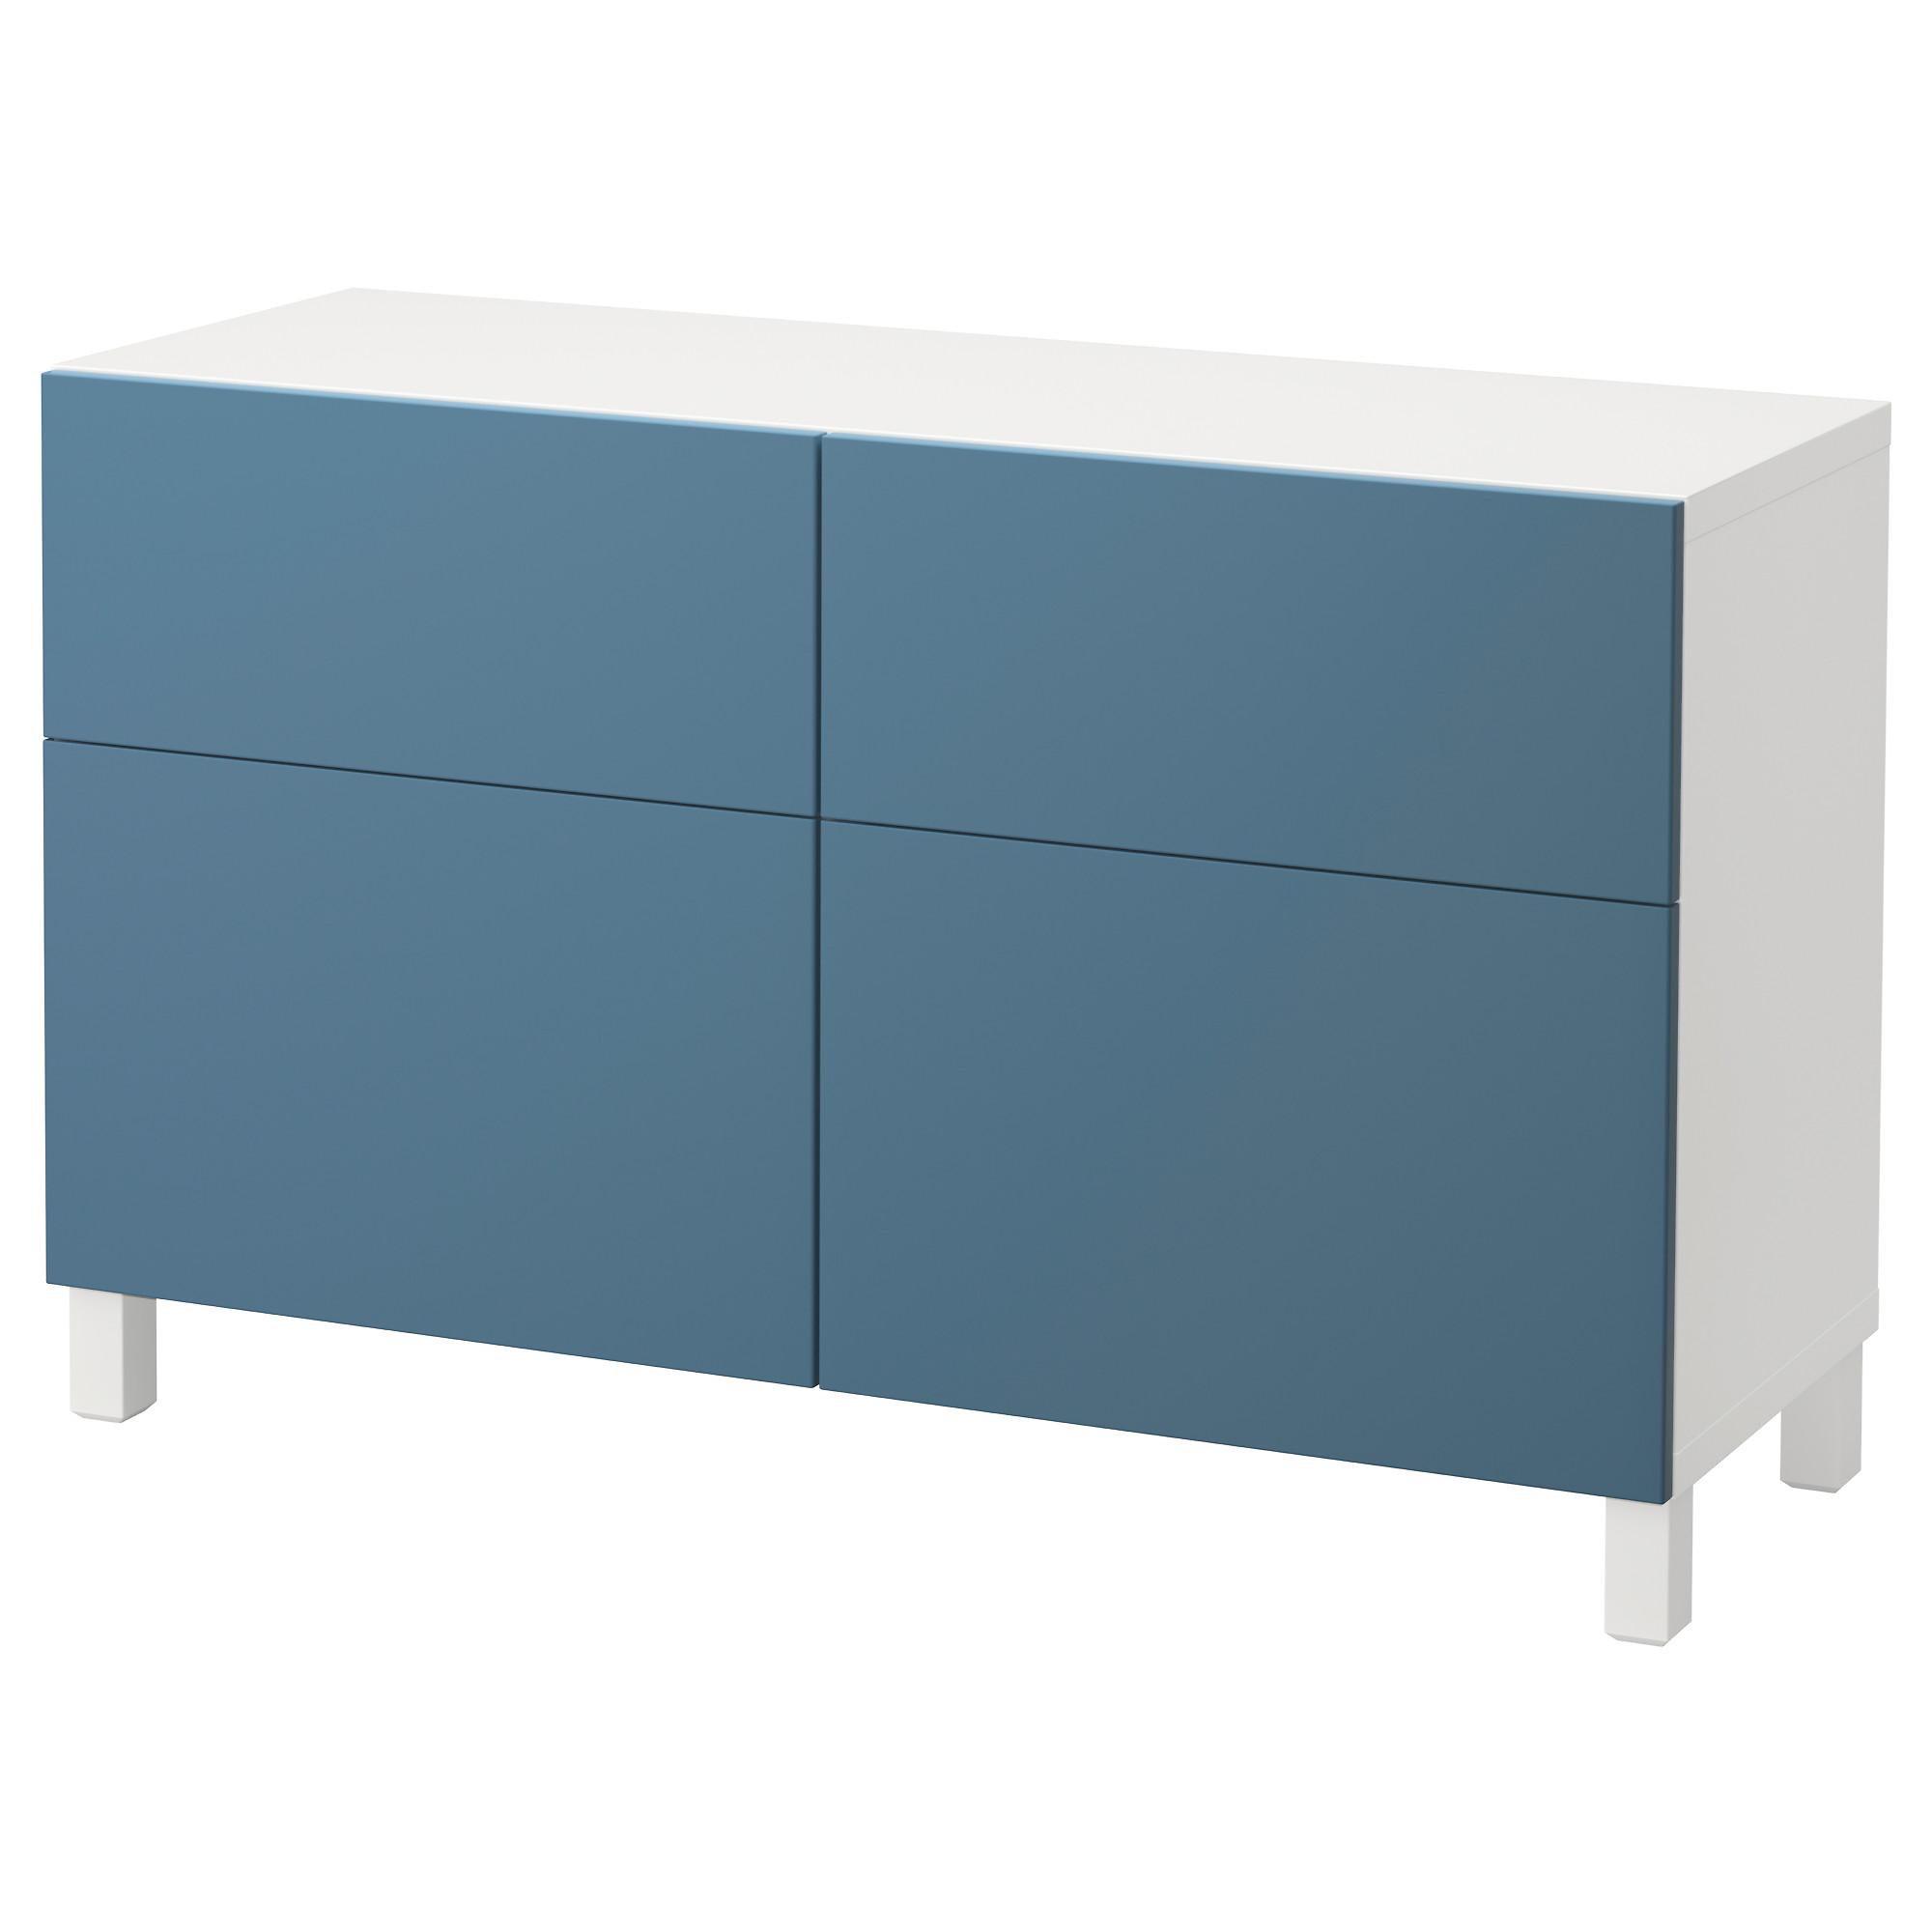 Комбинация для хранения с дверцами, ящиками БЕСТО темно-синий артикуль № 192.492.32 в наличии. Онлайн магазин IKEA Республика Беларусь. Быстрая доставка и монтаж.